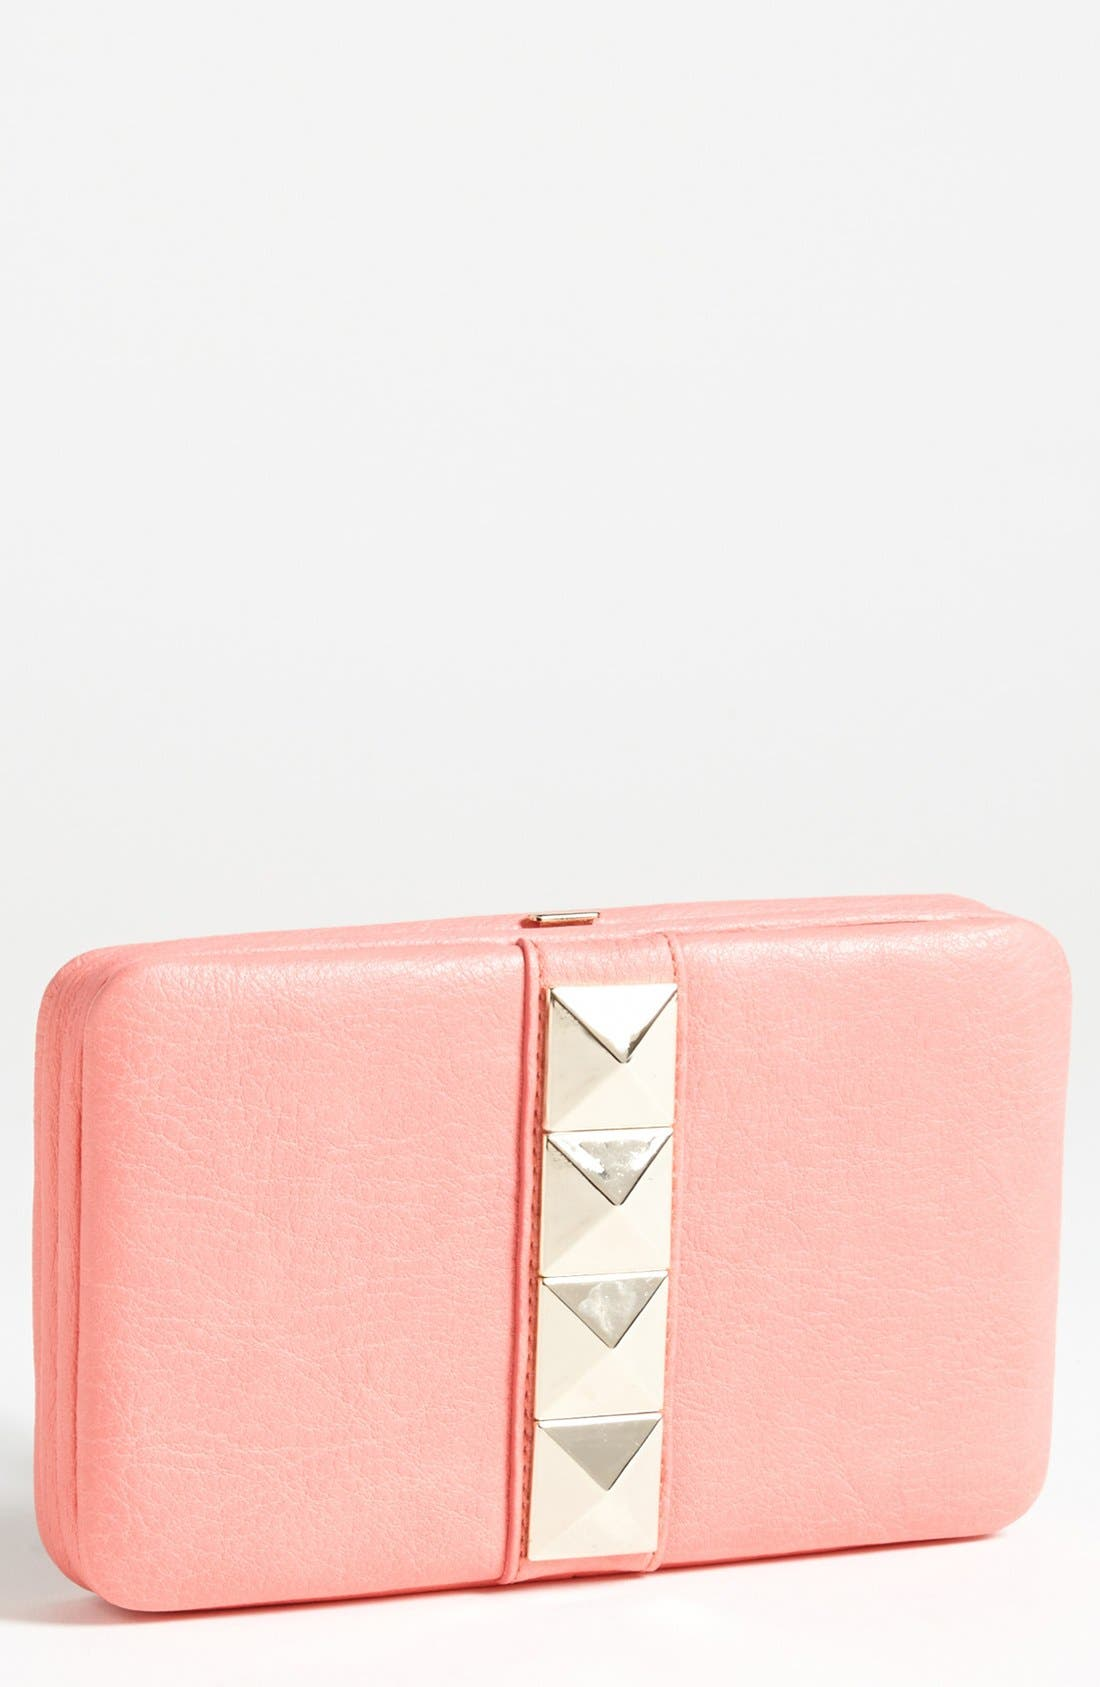 Main Image - Izzy & Ali 'Emma' Wallet